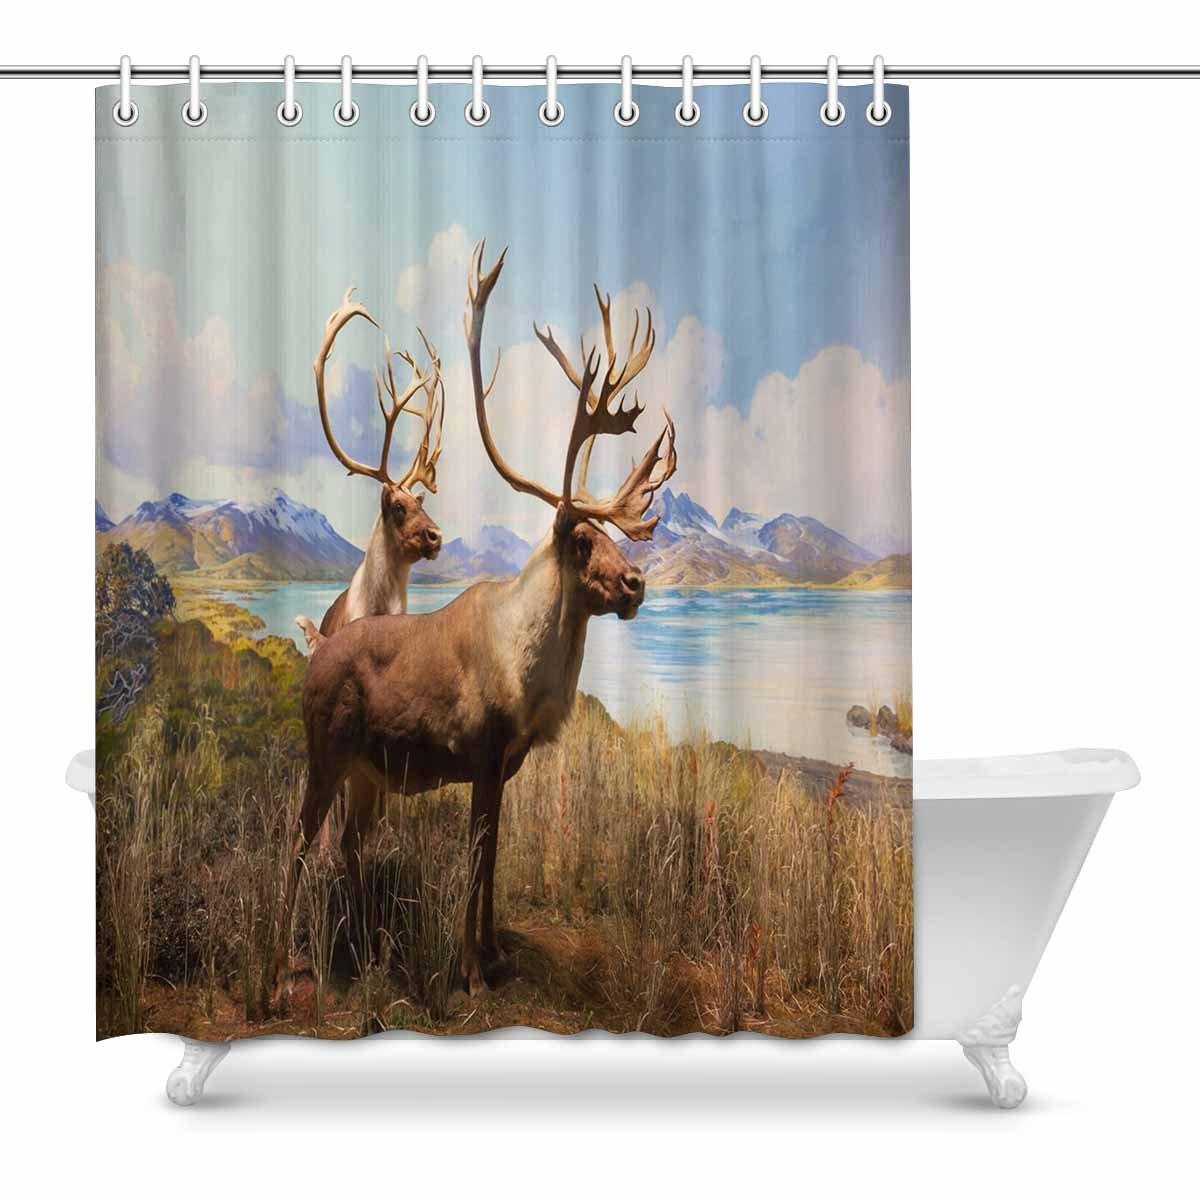 interestprint Herdの鹿アートの印刷ポリエステルファブリックシャワーカーテンセット 60 海外輸入 x 72インチ長 マルチ1 72 X inches 奉呈 B07BDGV3VZ